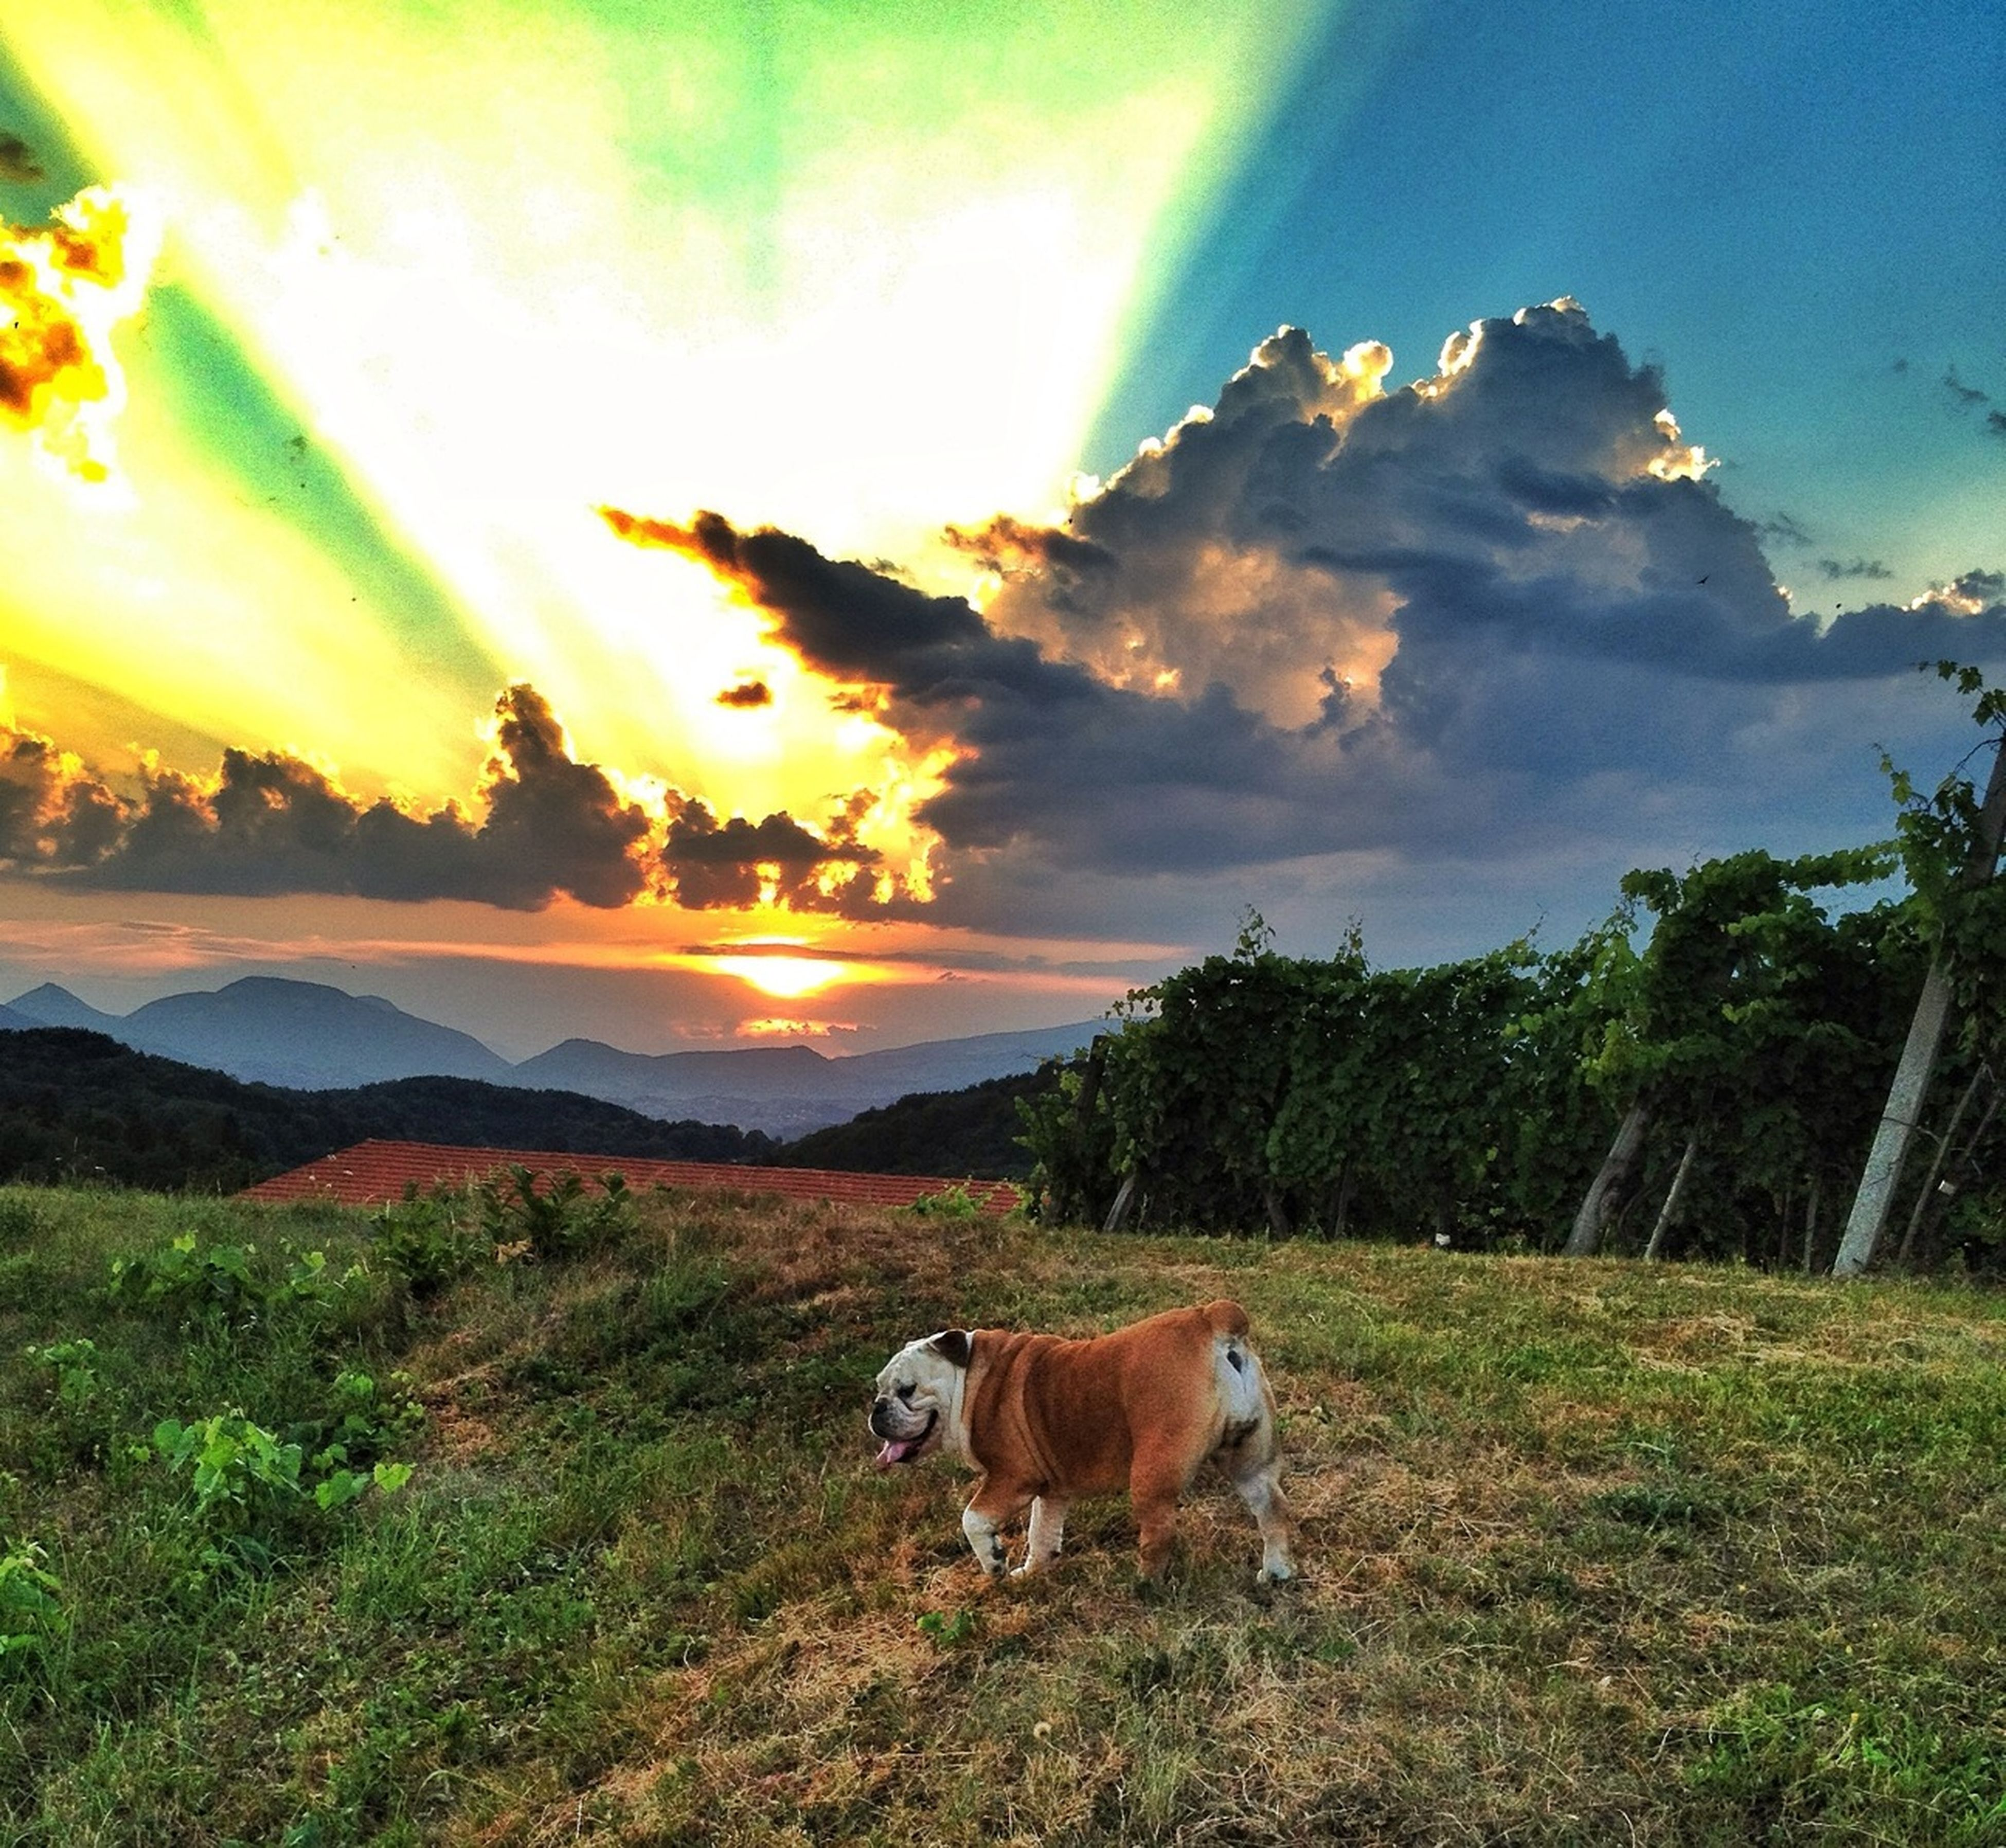 domestic animals, animal themes, mammal, one animal, pets, sky, grass, dog, cloud - sky, sunset, tranquil scene, landscape, field, tranquility, nature, sun, scenics, beauty in nature, sunlight, livestock